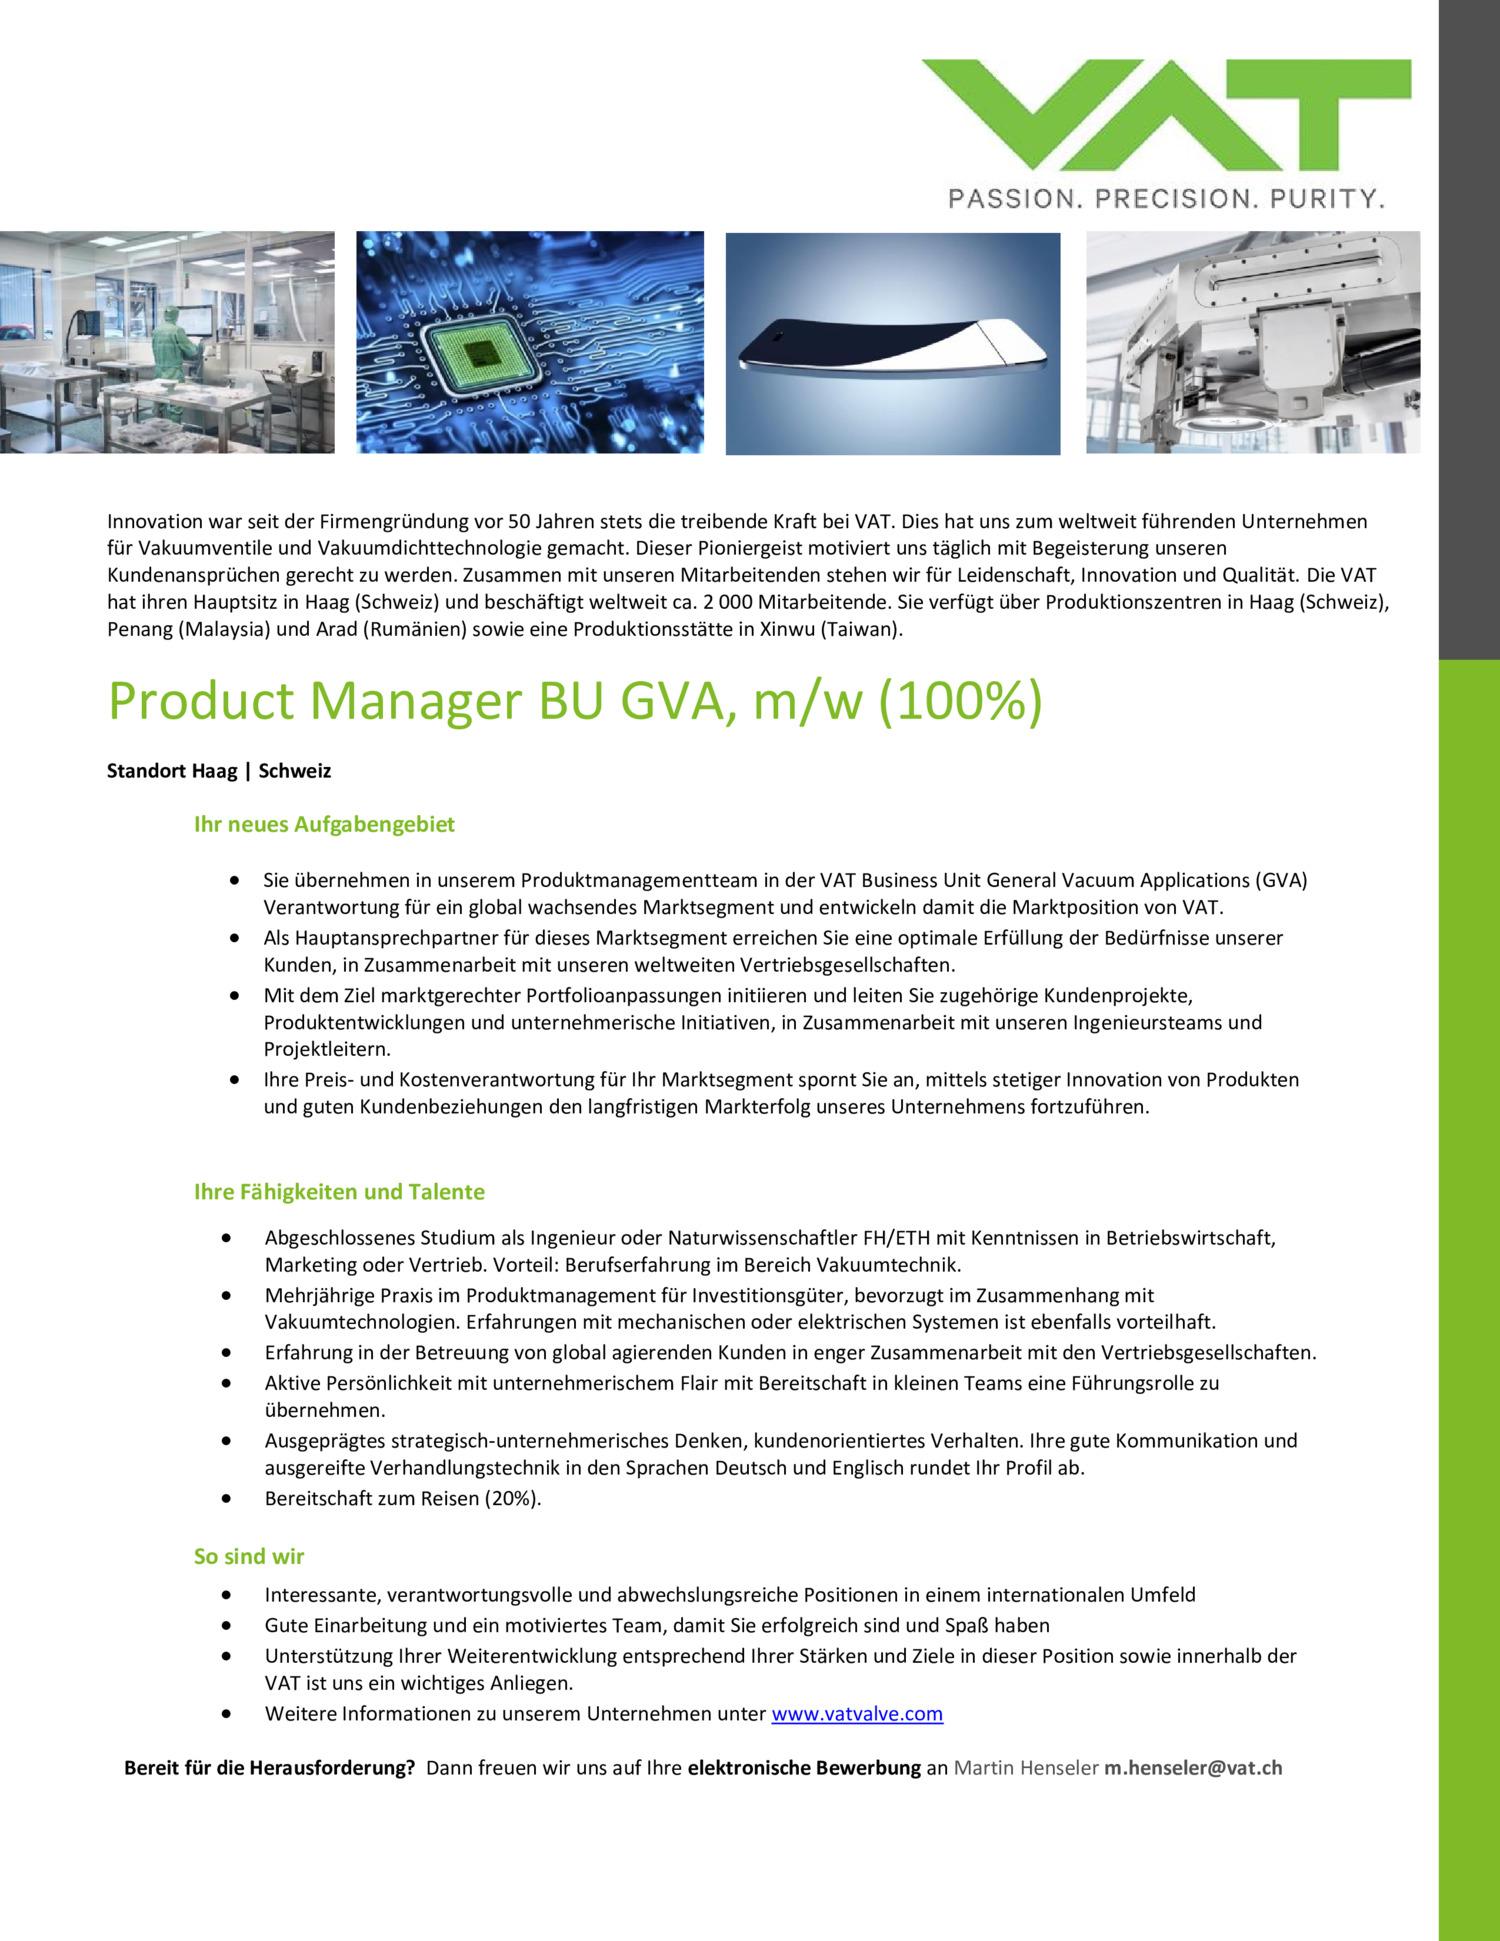 Inserat Product Manager BU GVA, M/W (100%)